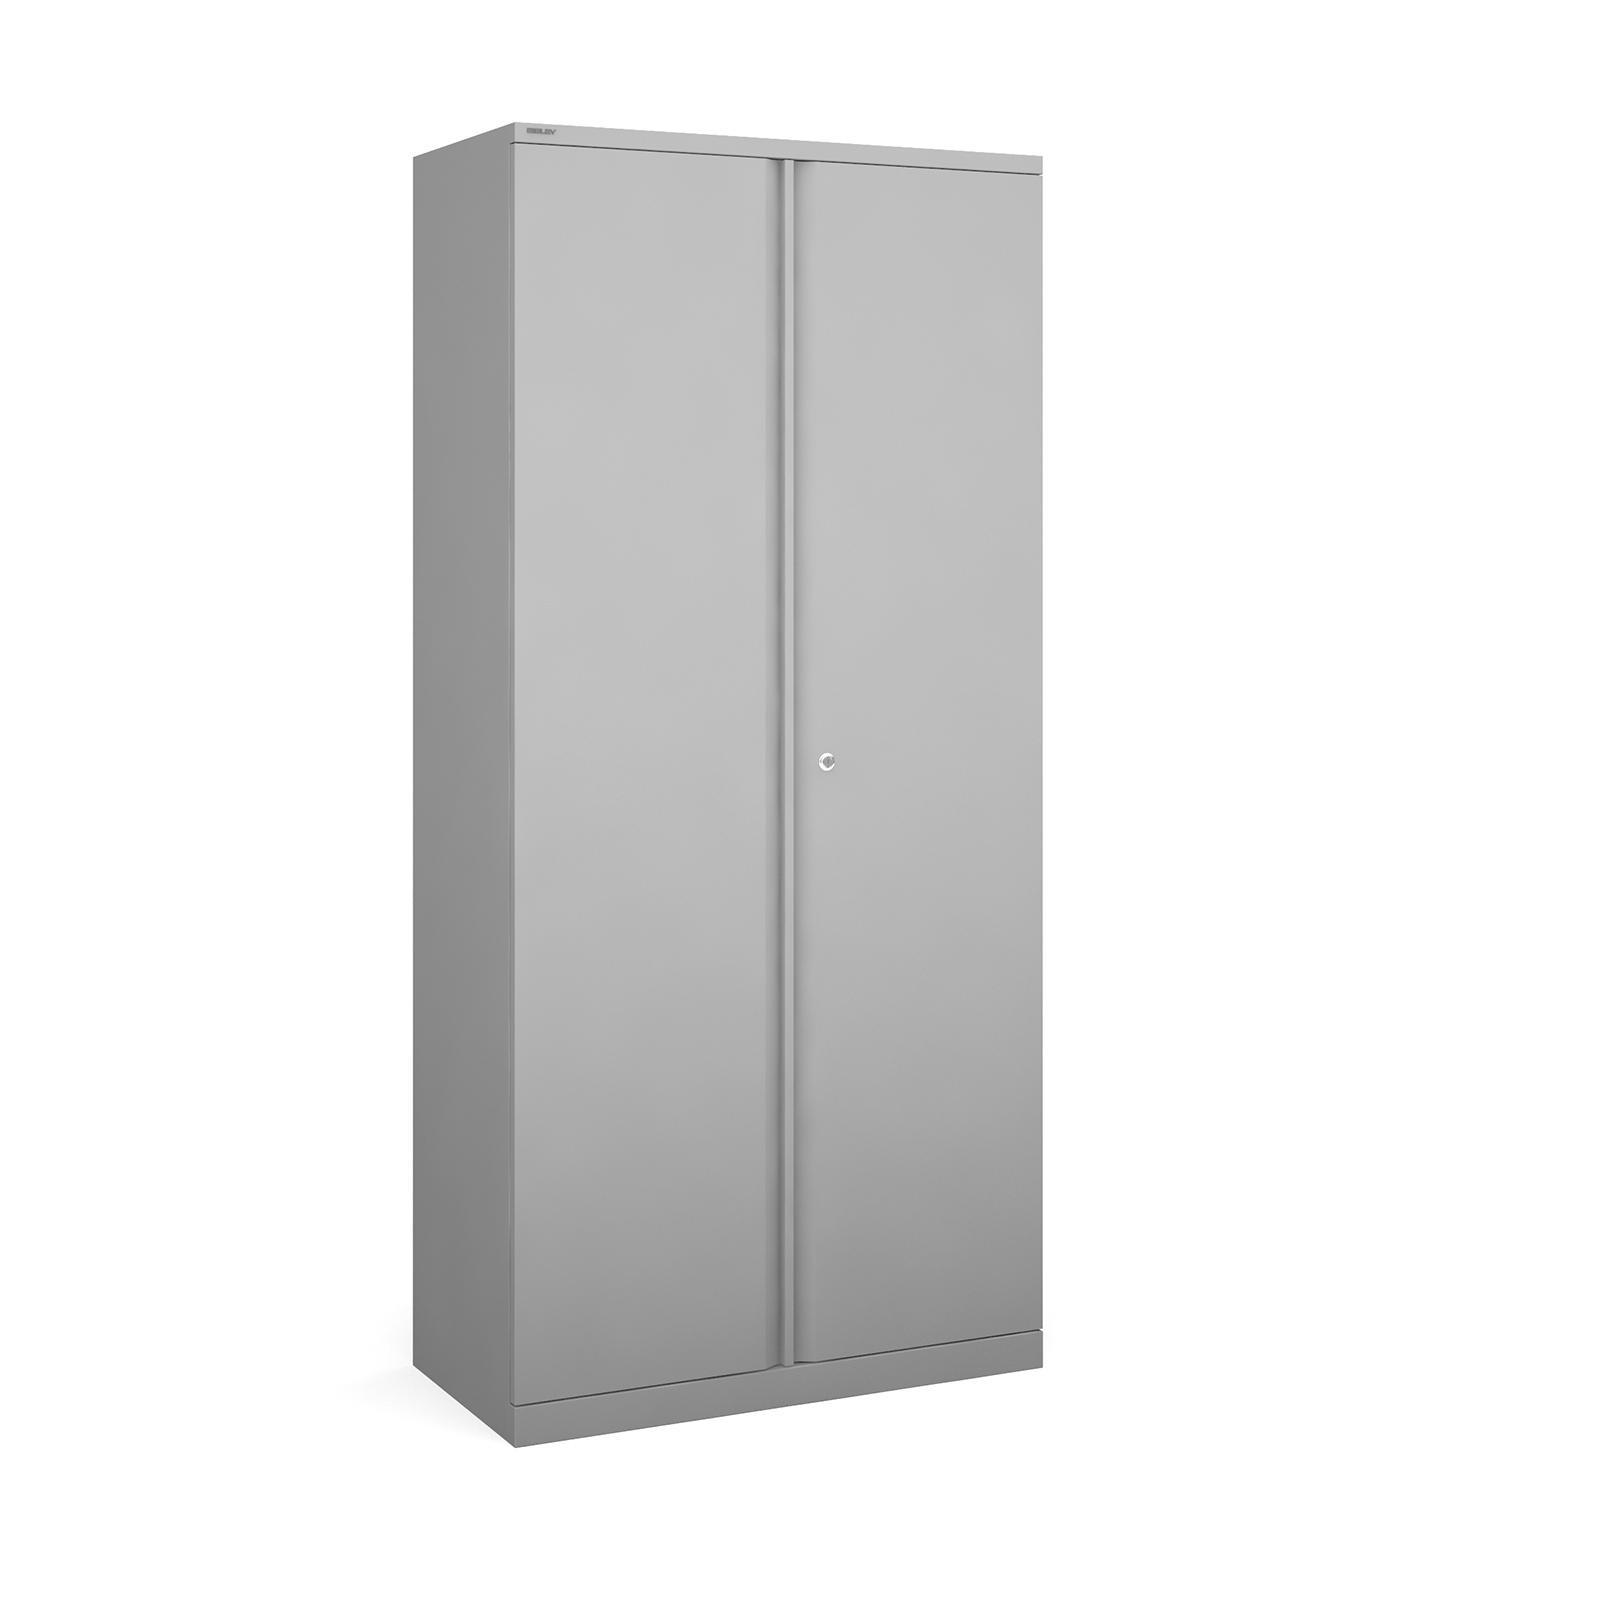 Bisley systems storage high cupboard 1970mm high - silver